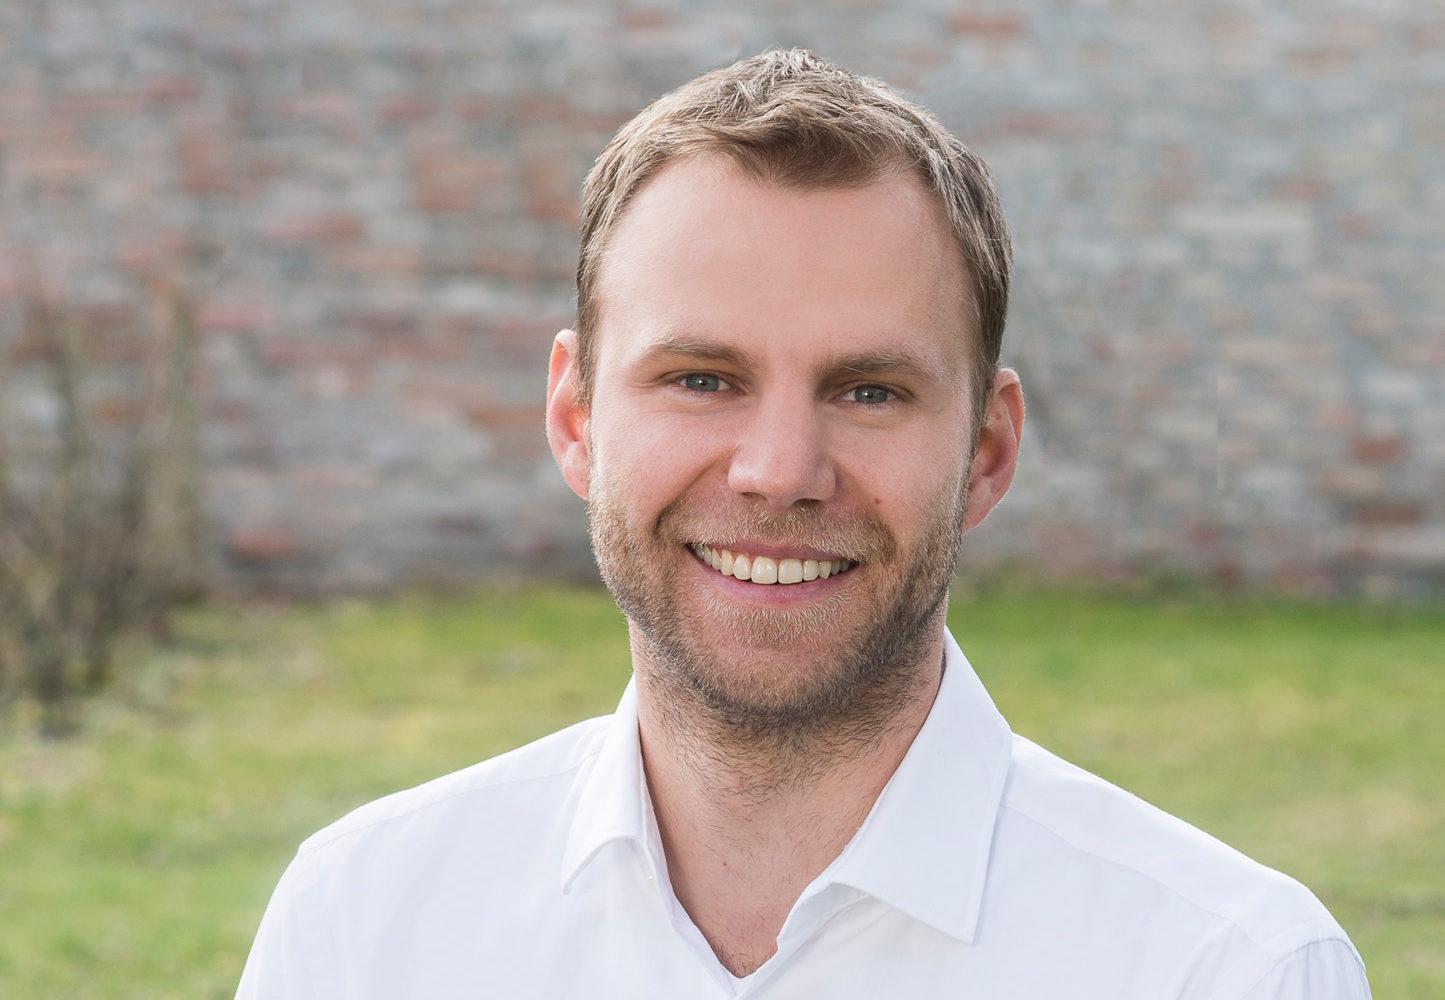 Stefan Weller